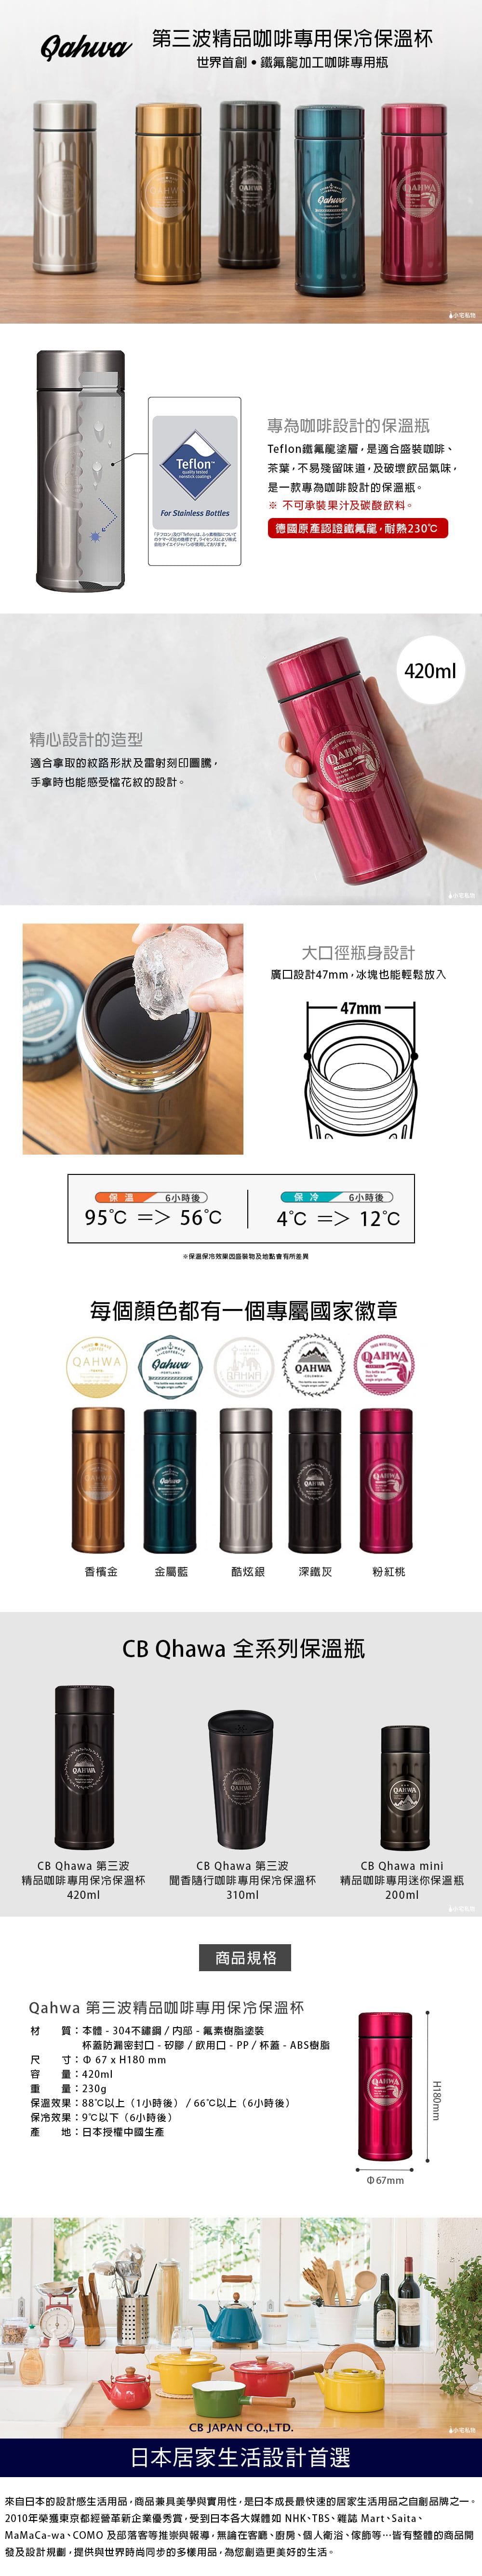 CB Japan Qahwa 第三波精品咖啡專用保冷保溫杯 粉紅桃